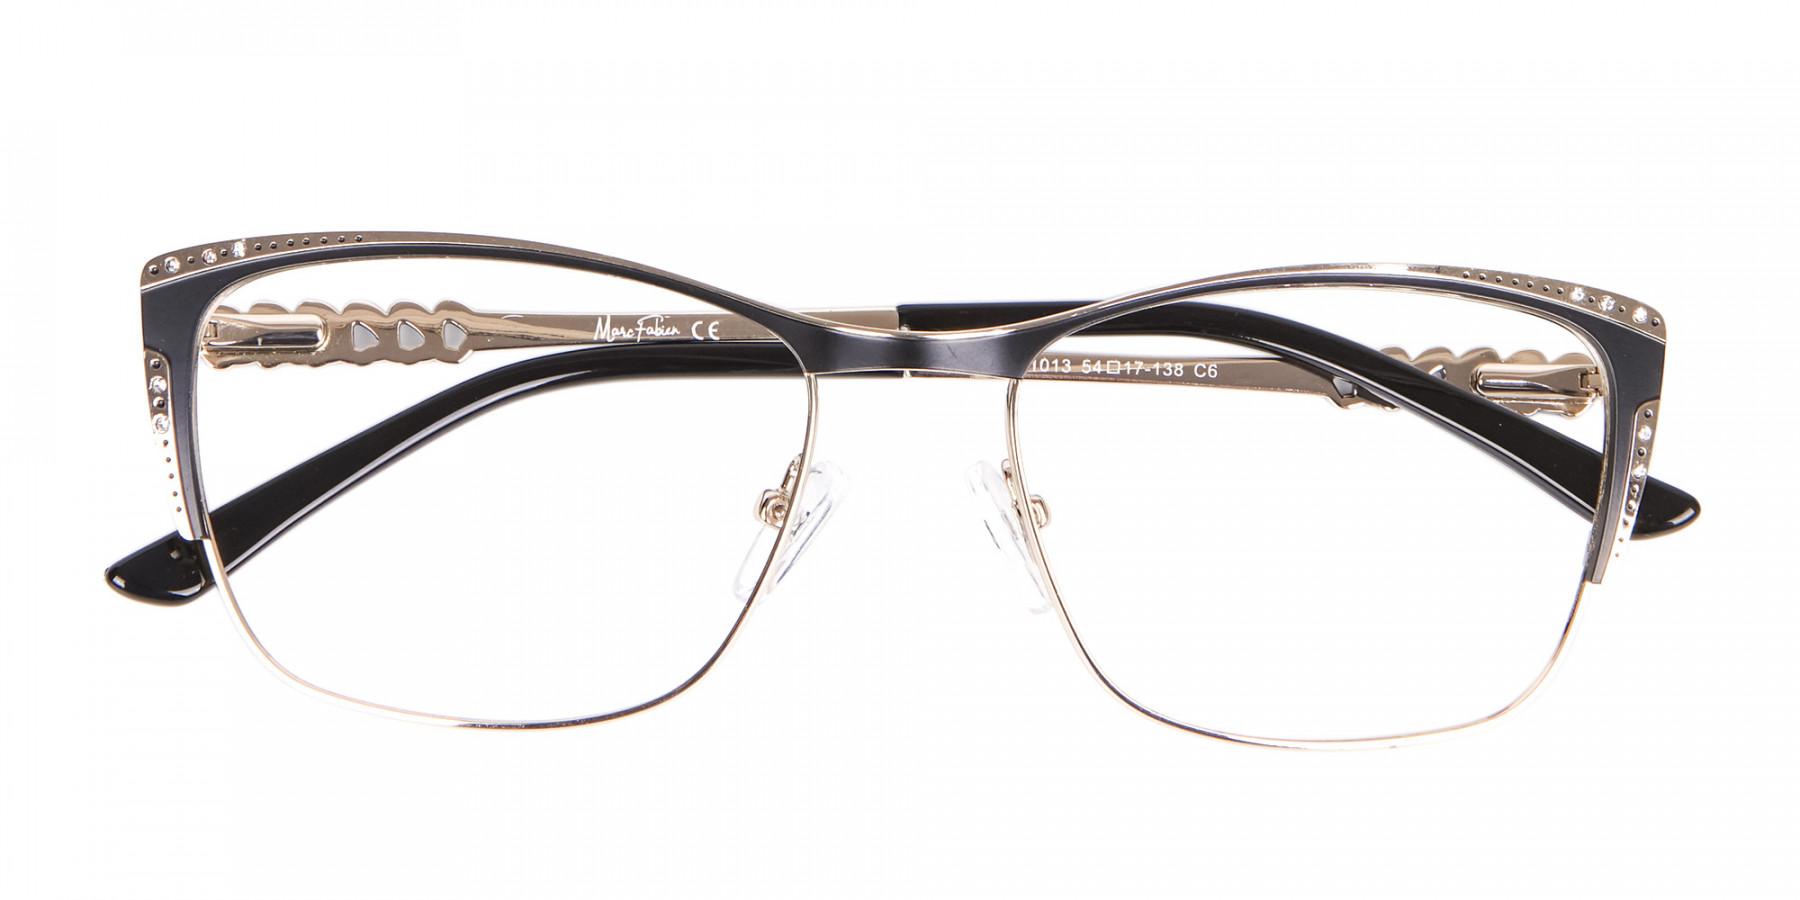 Lady Glasses Rectangular and Cateye-1